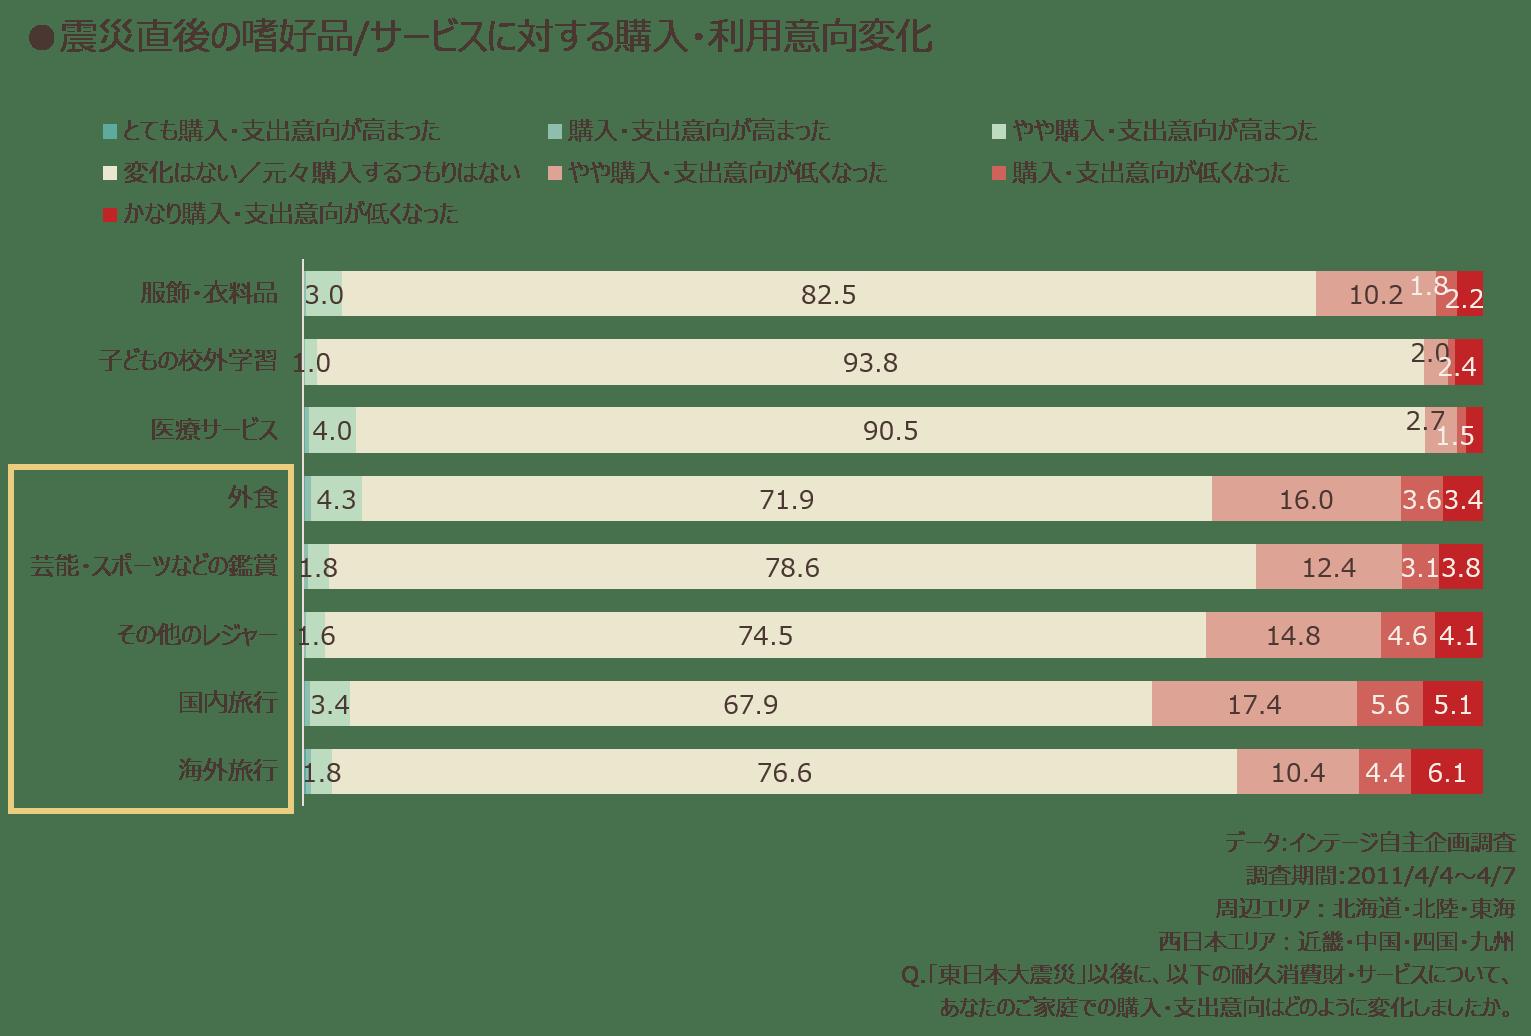 shinsai_06.png